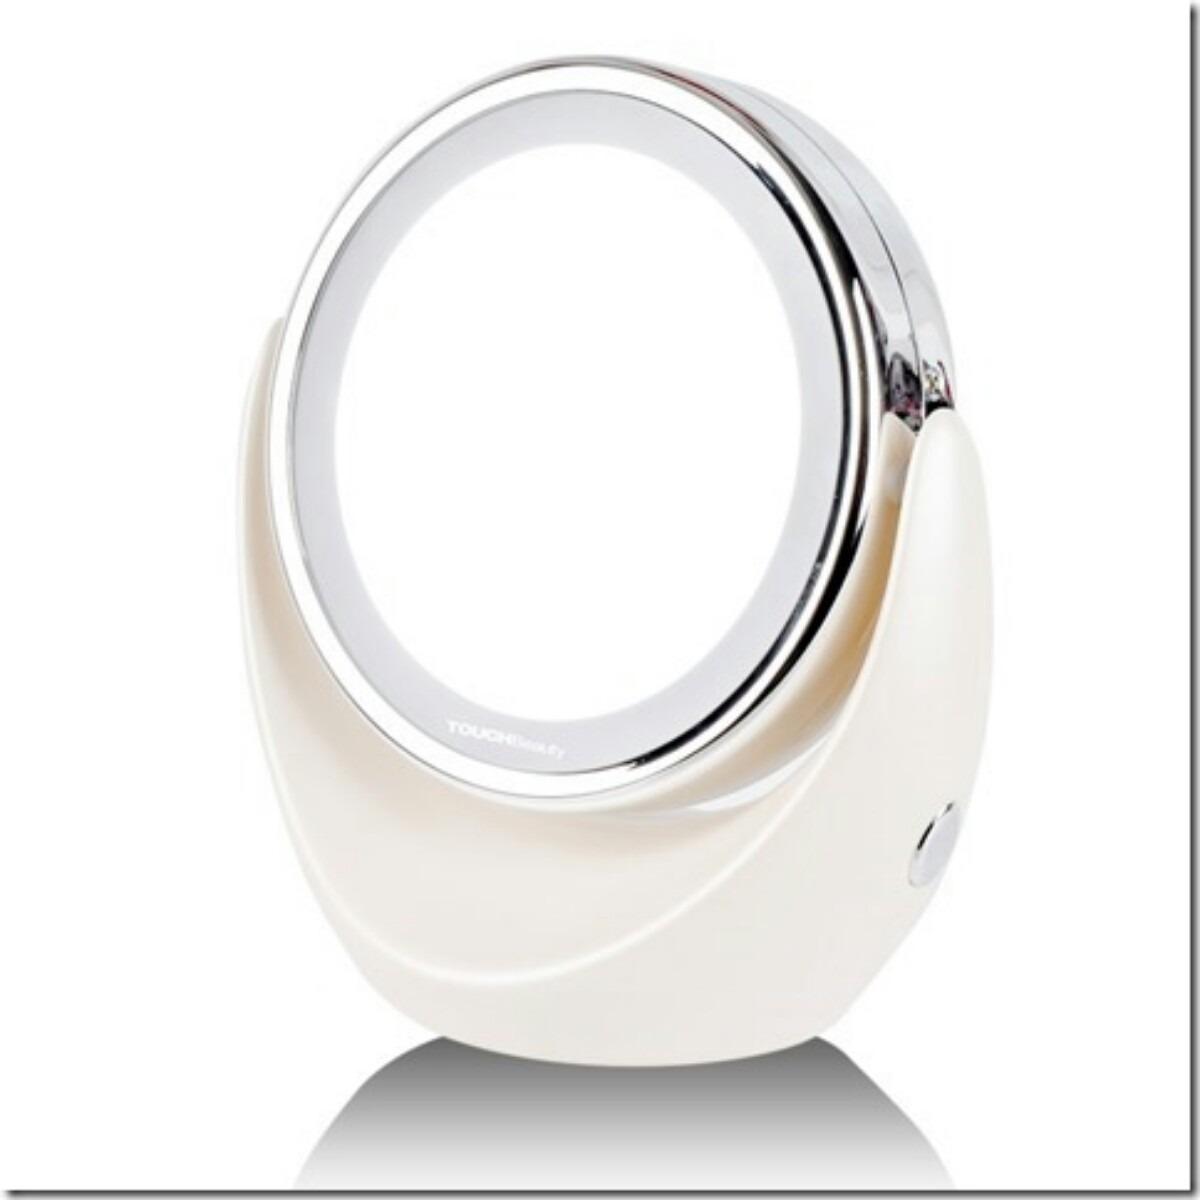 Espejo doble faz c luz led espejo con aumento x1 y x5 for Espejo aumento con luz